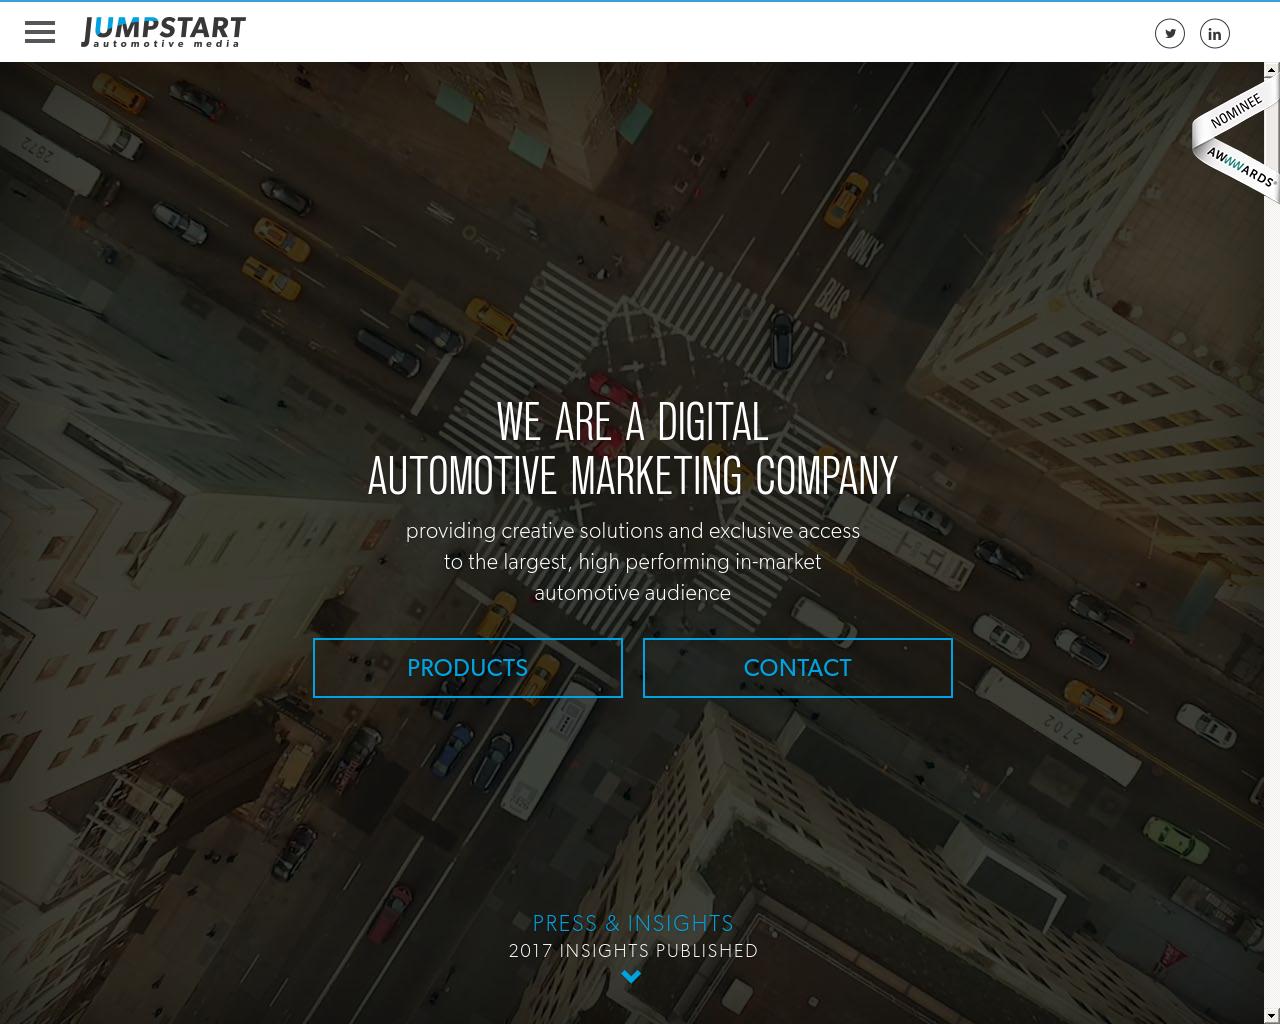 Jumpstart-Automotive-Group-Advertising-Reviews-Pricing